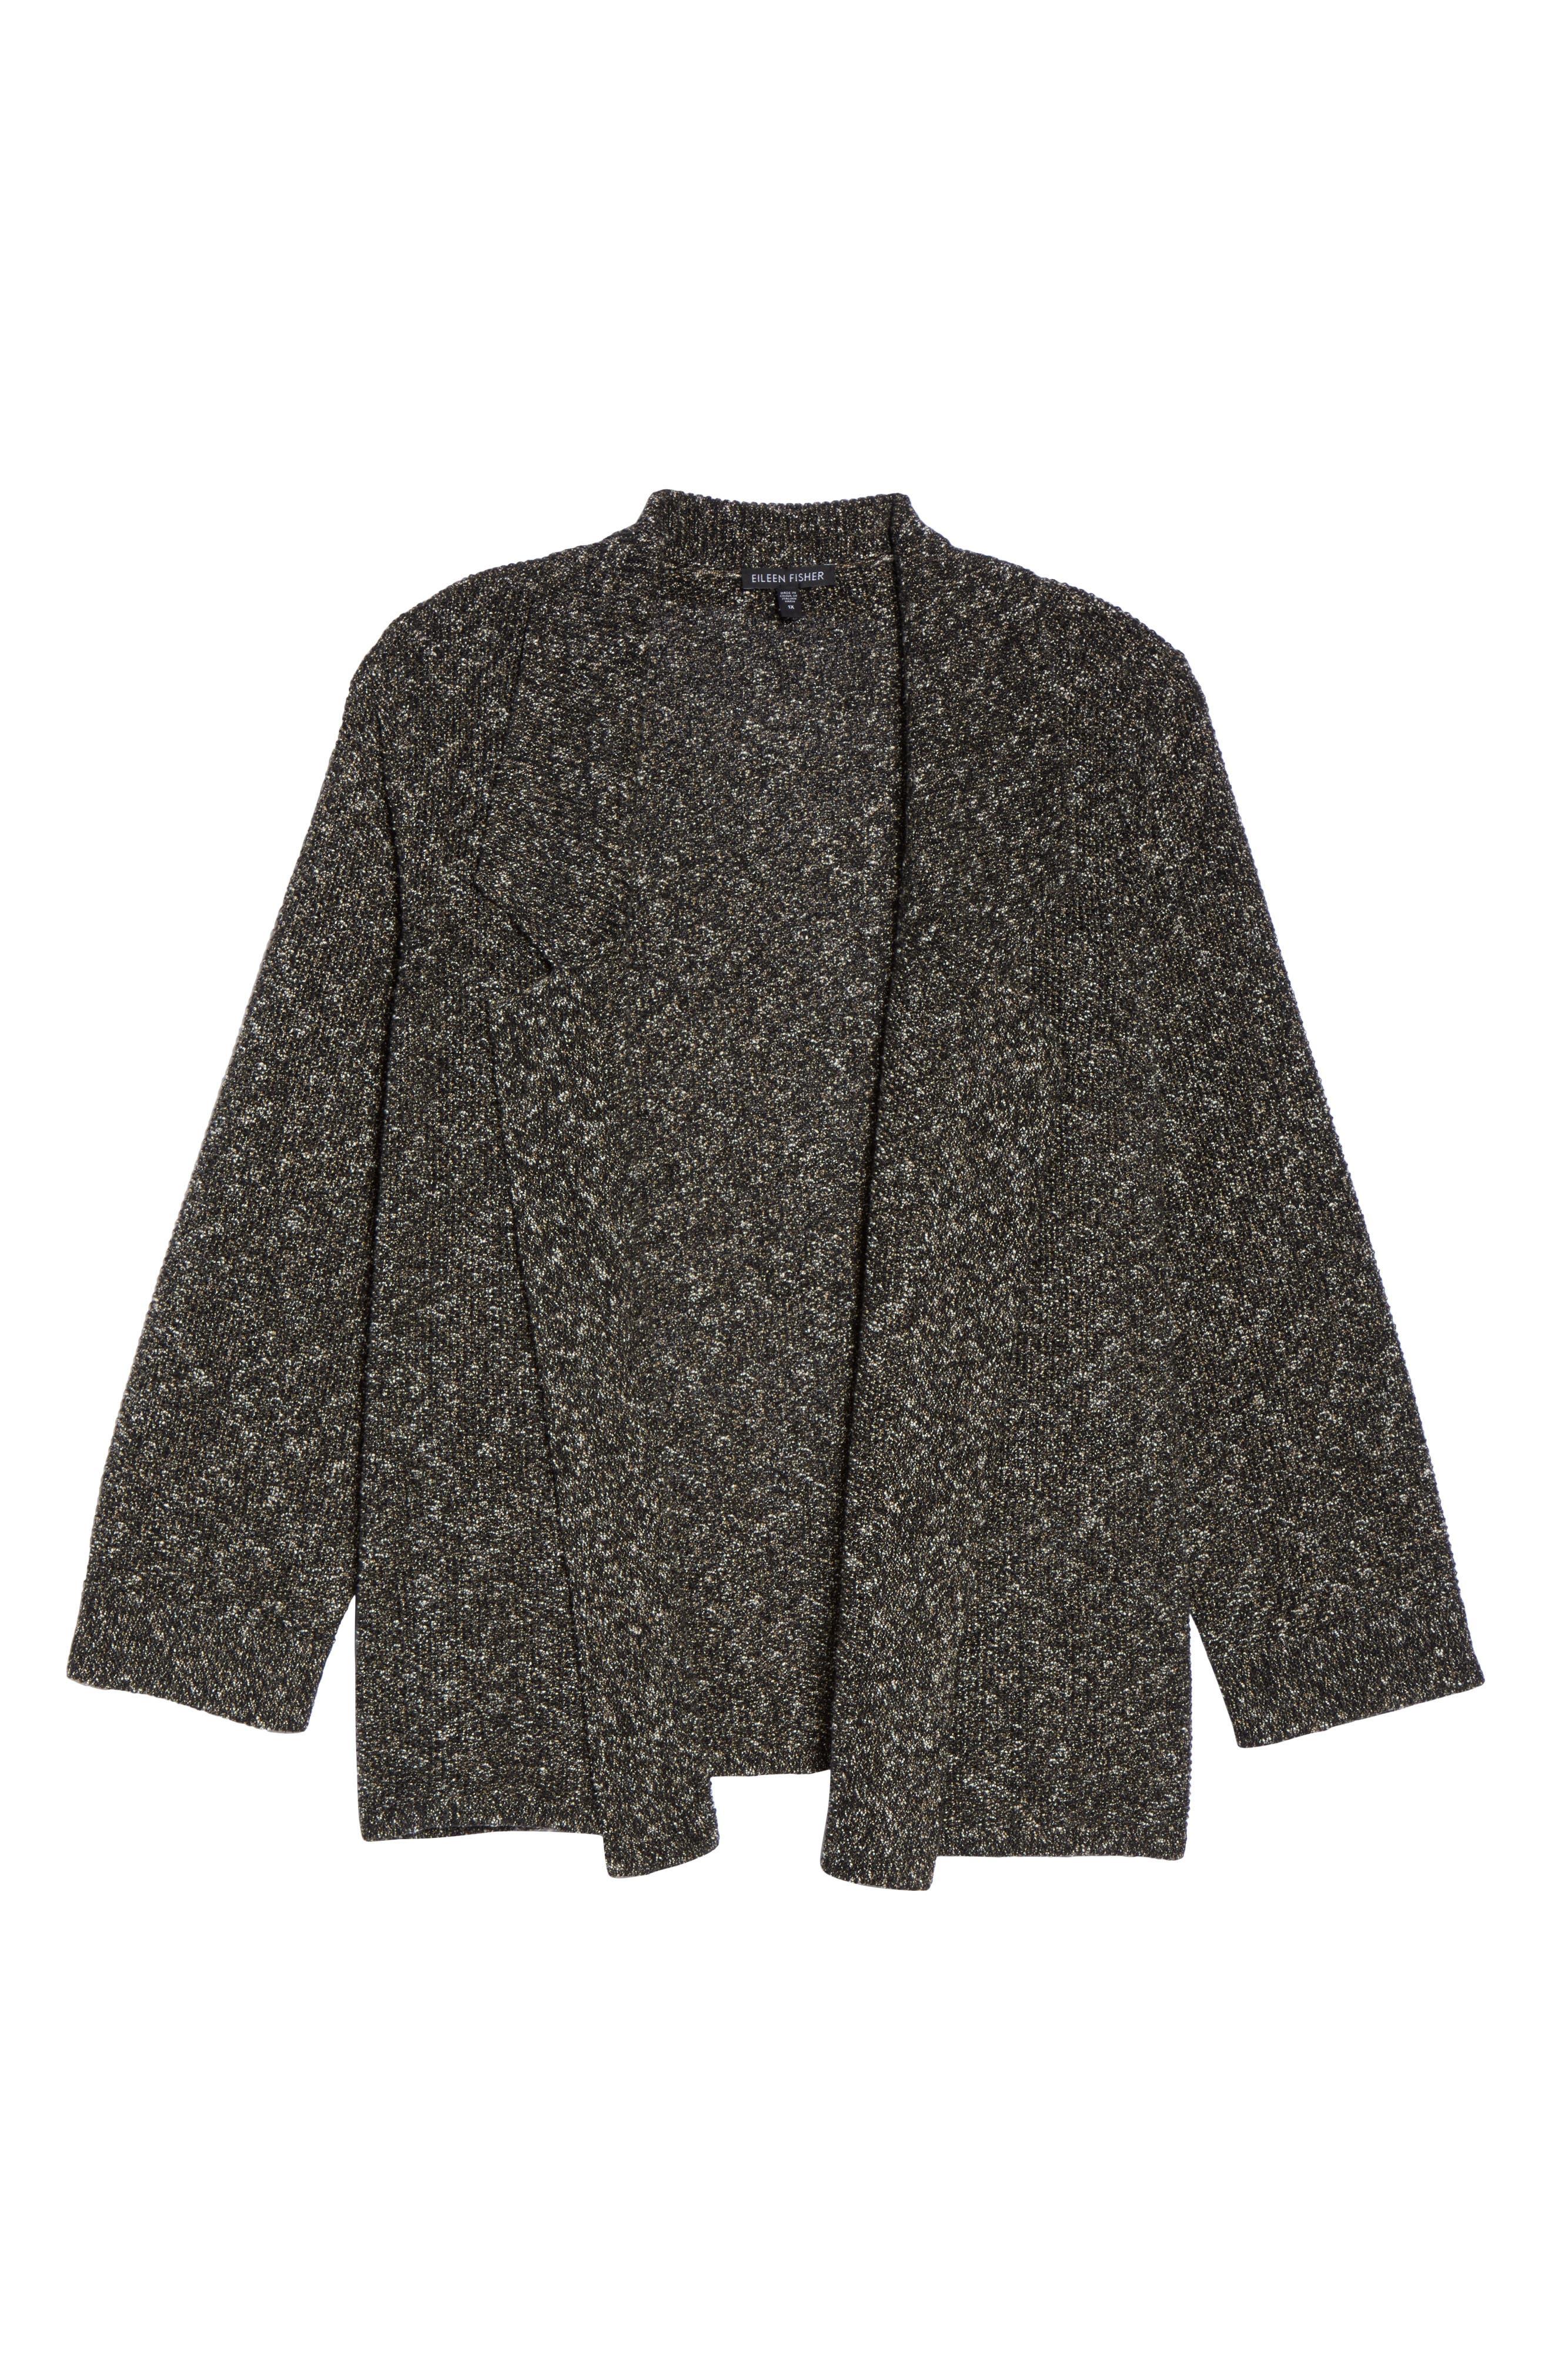 Organic Cotton Blend Sweater Jacket,                             Alternate thumbnail 6, color,                             Black